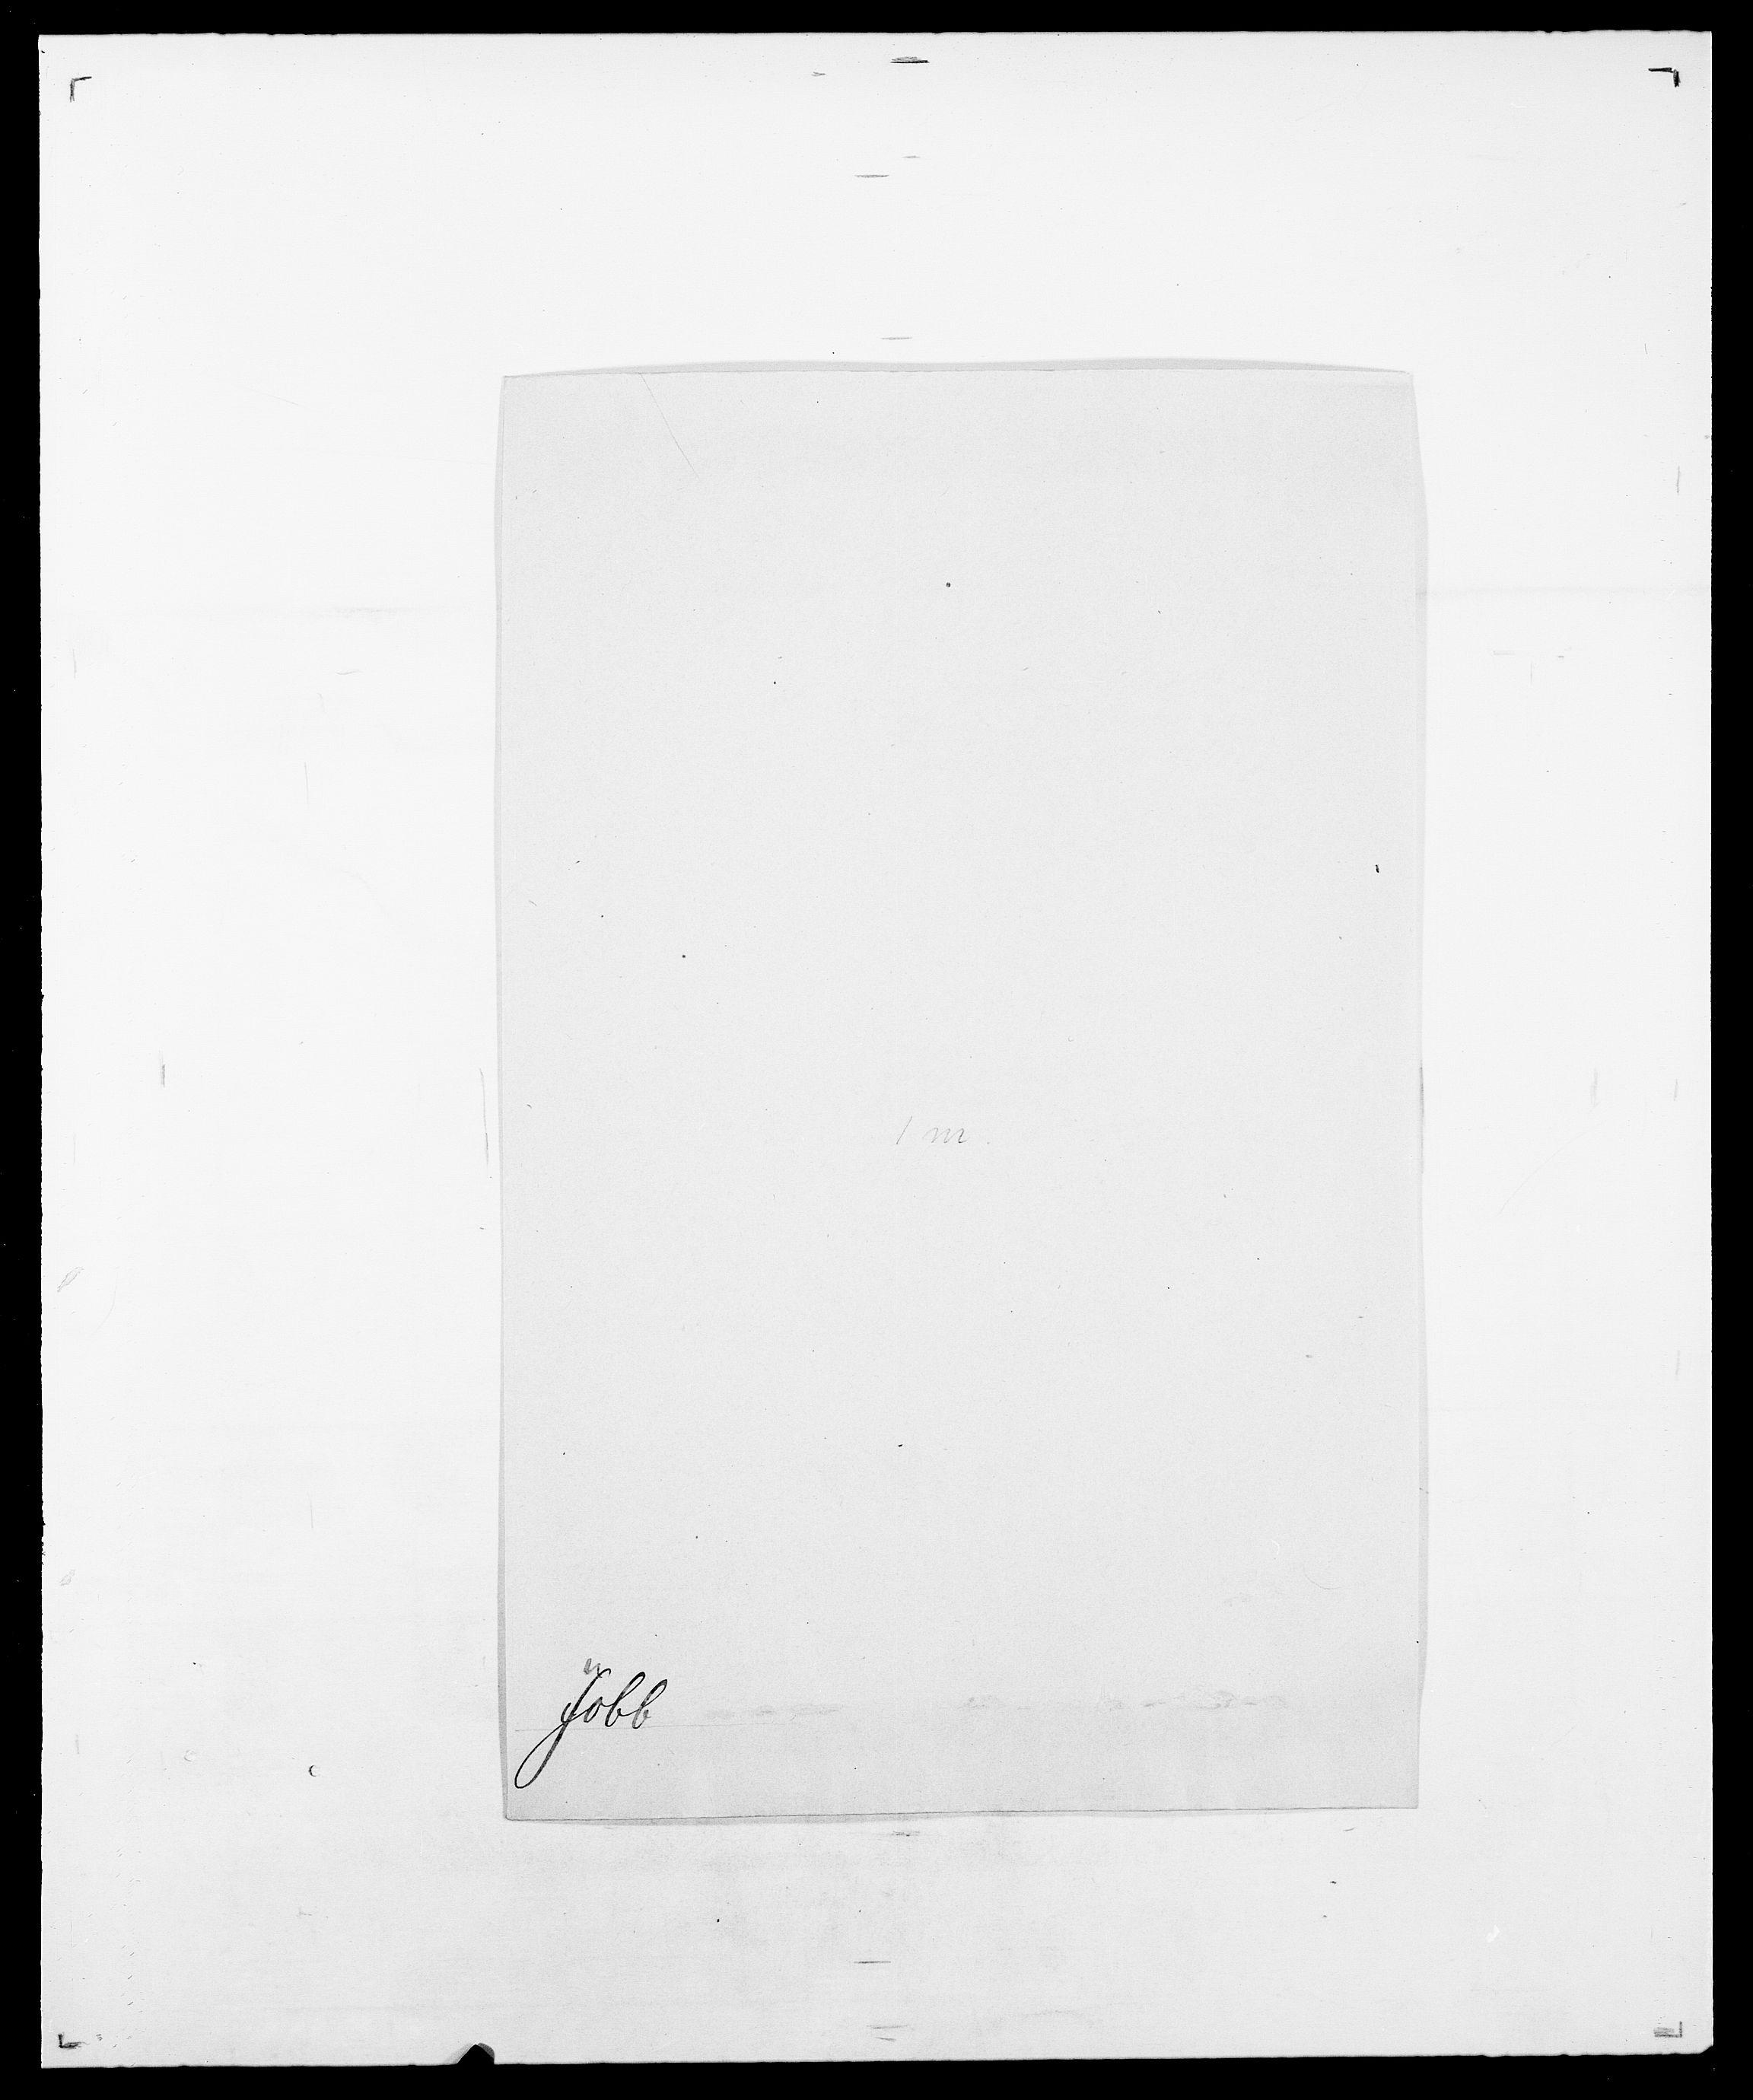 SAO, Delgobe, Charles Antoine - samling, D/Da/L0019: van der Hude - Joys, s. 806